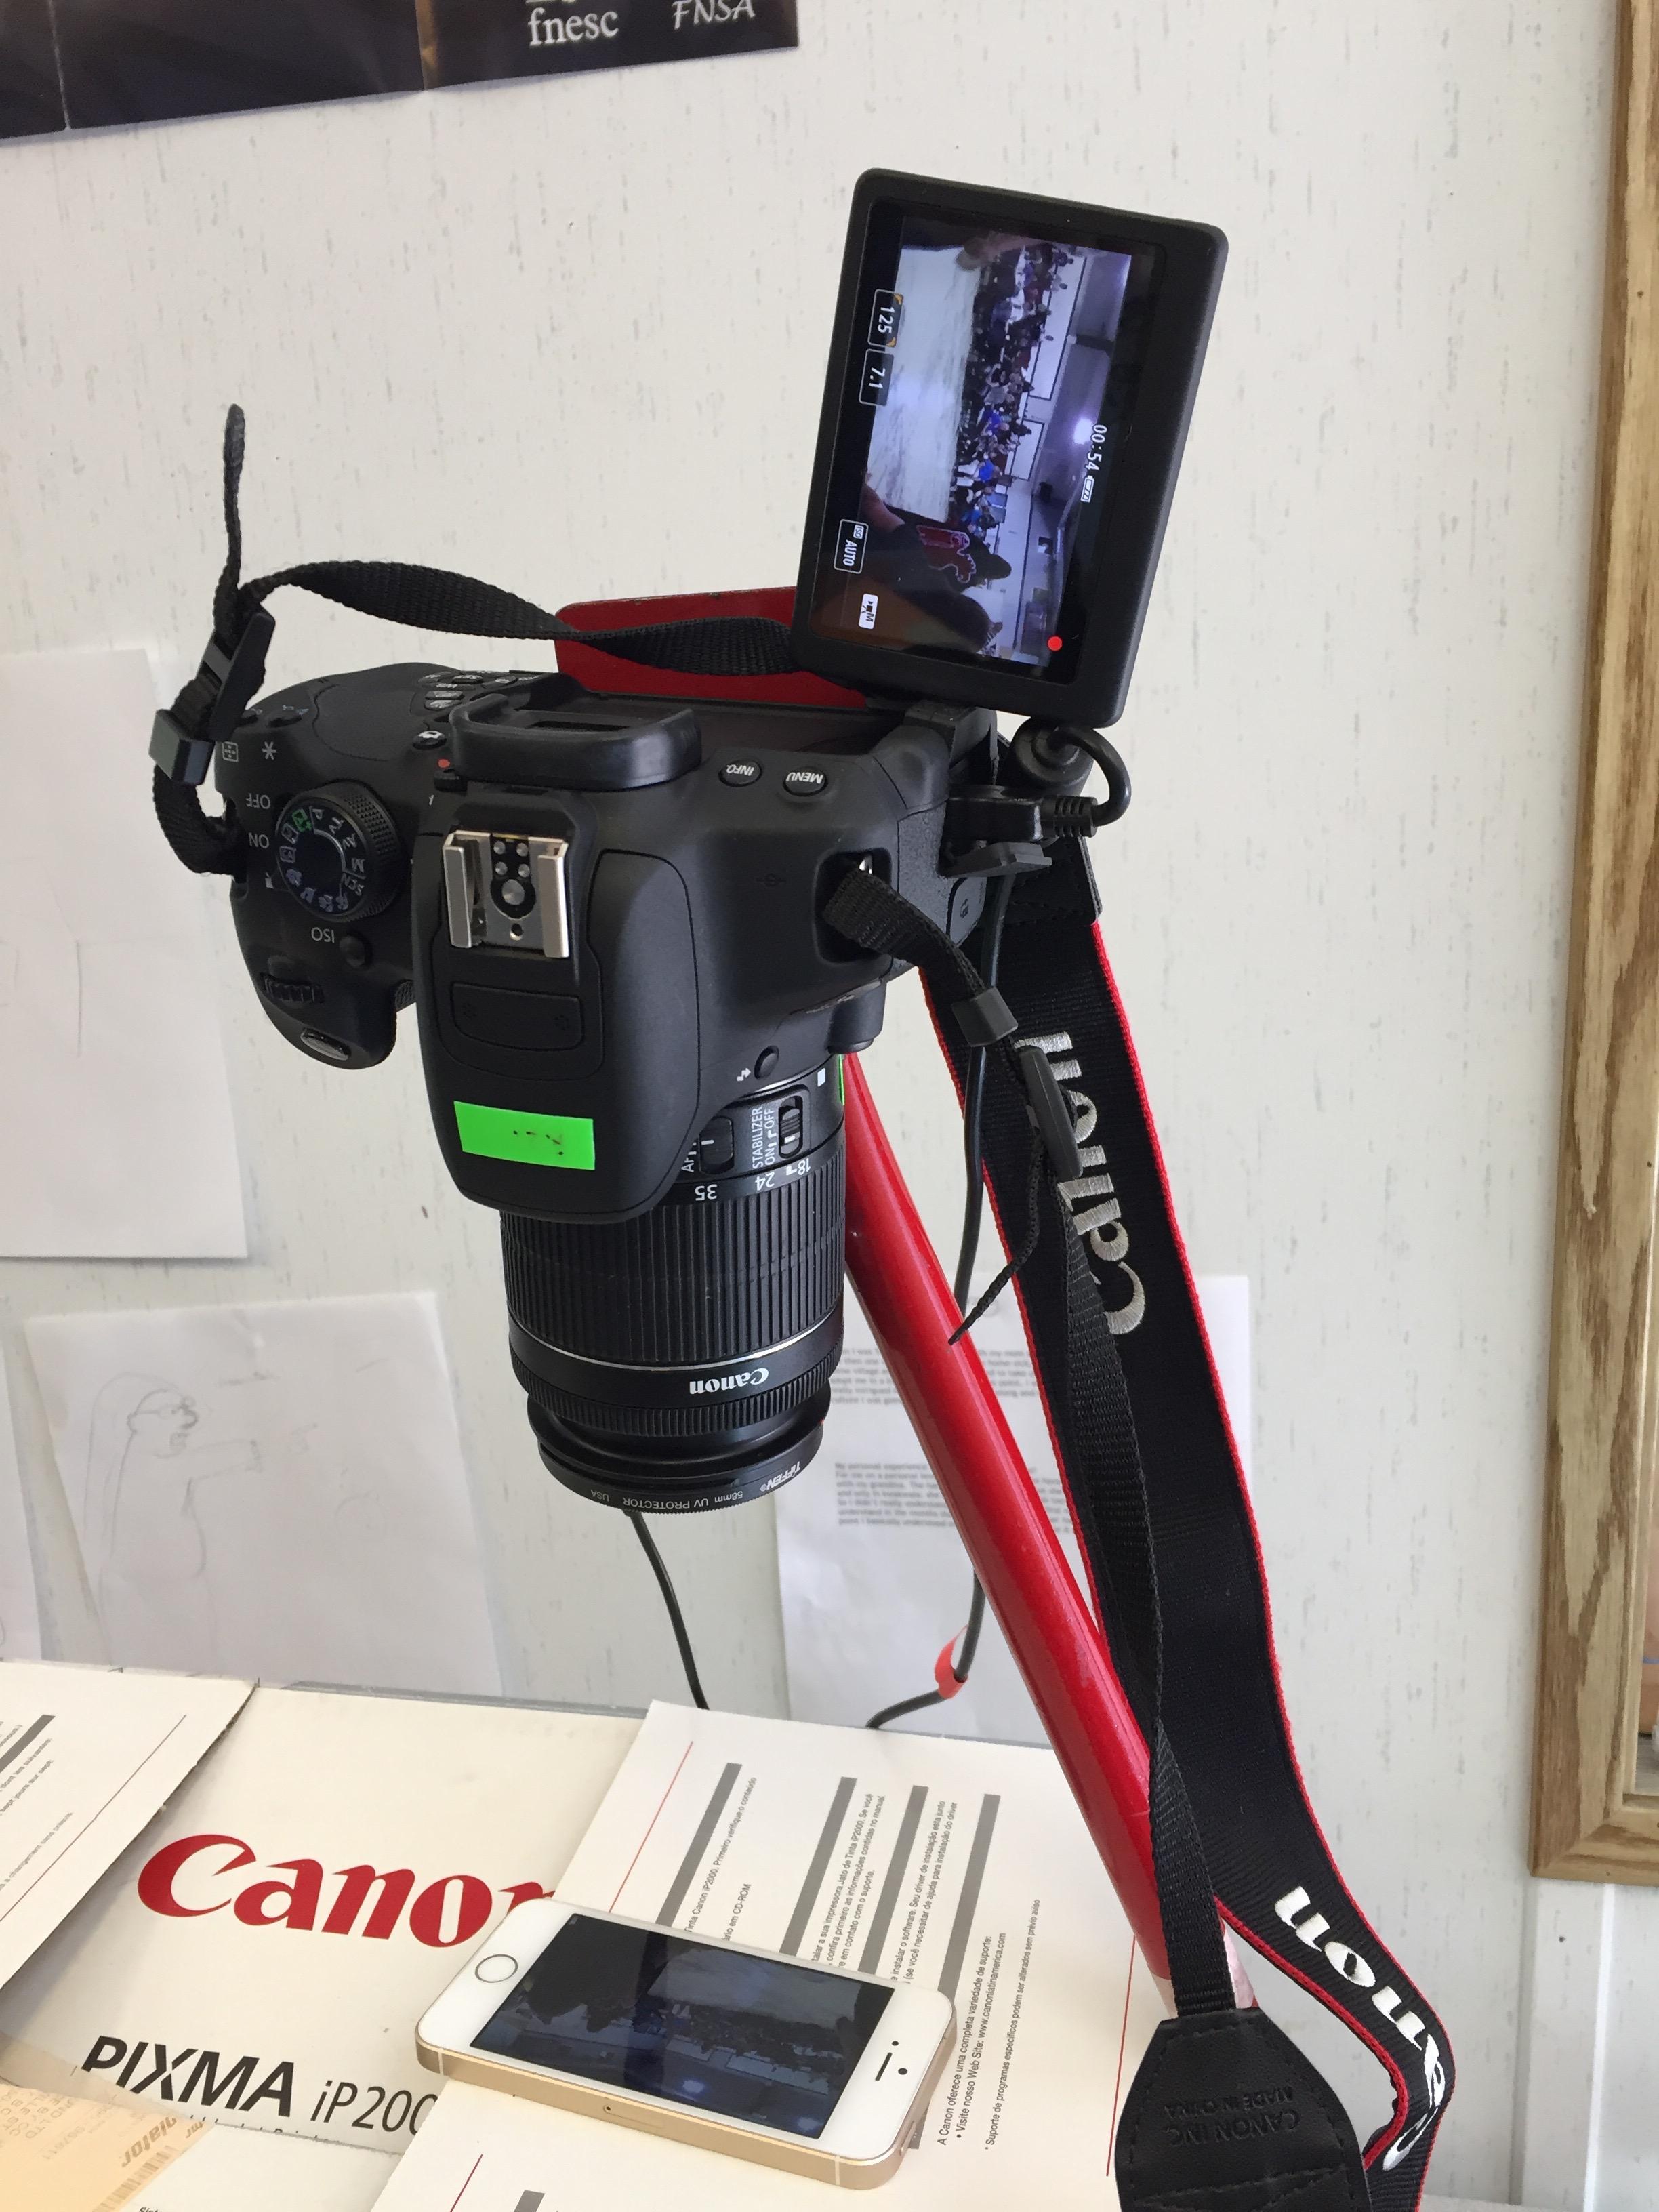 I phone video capture hack!